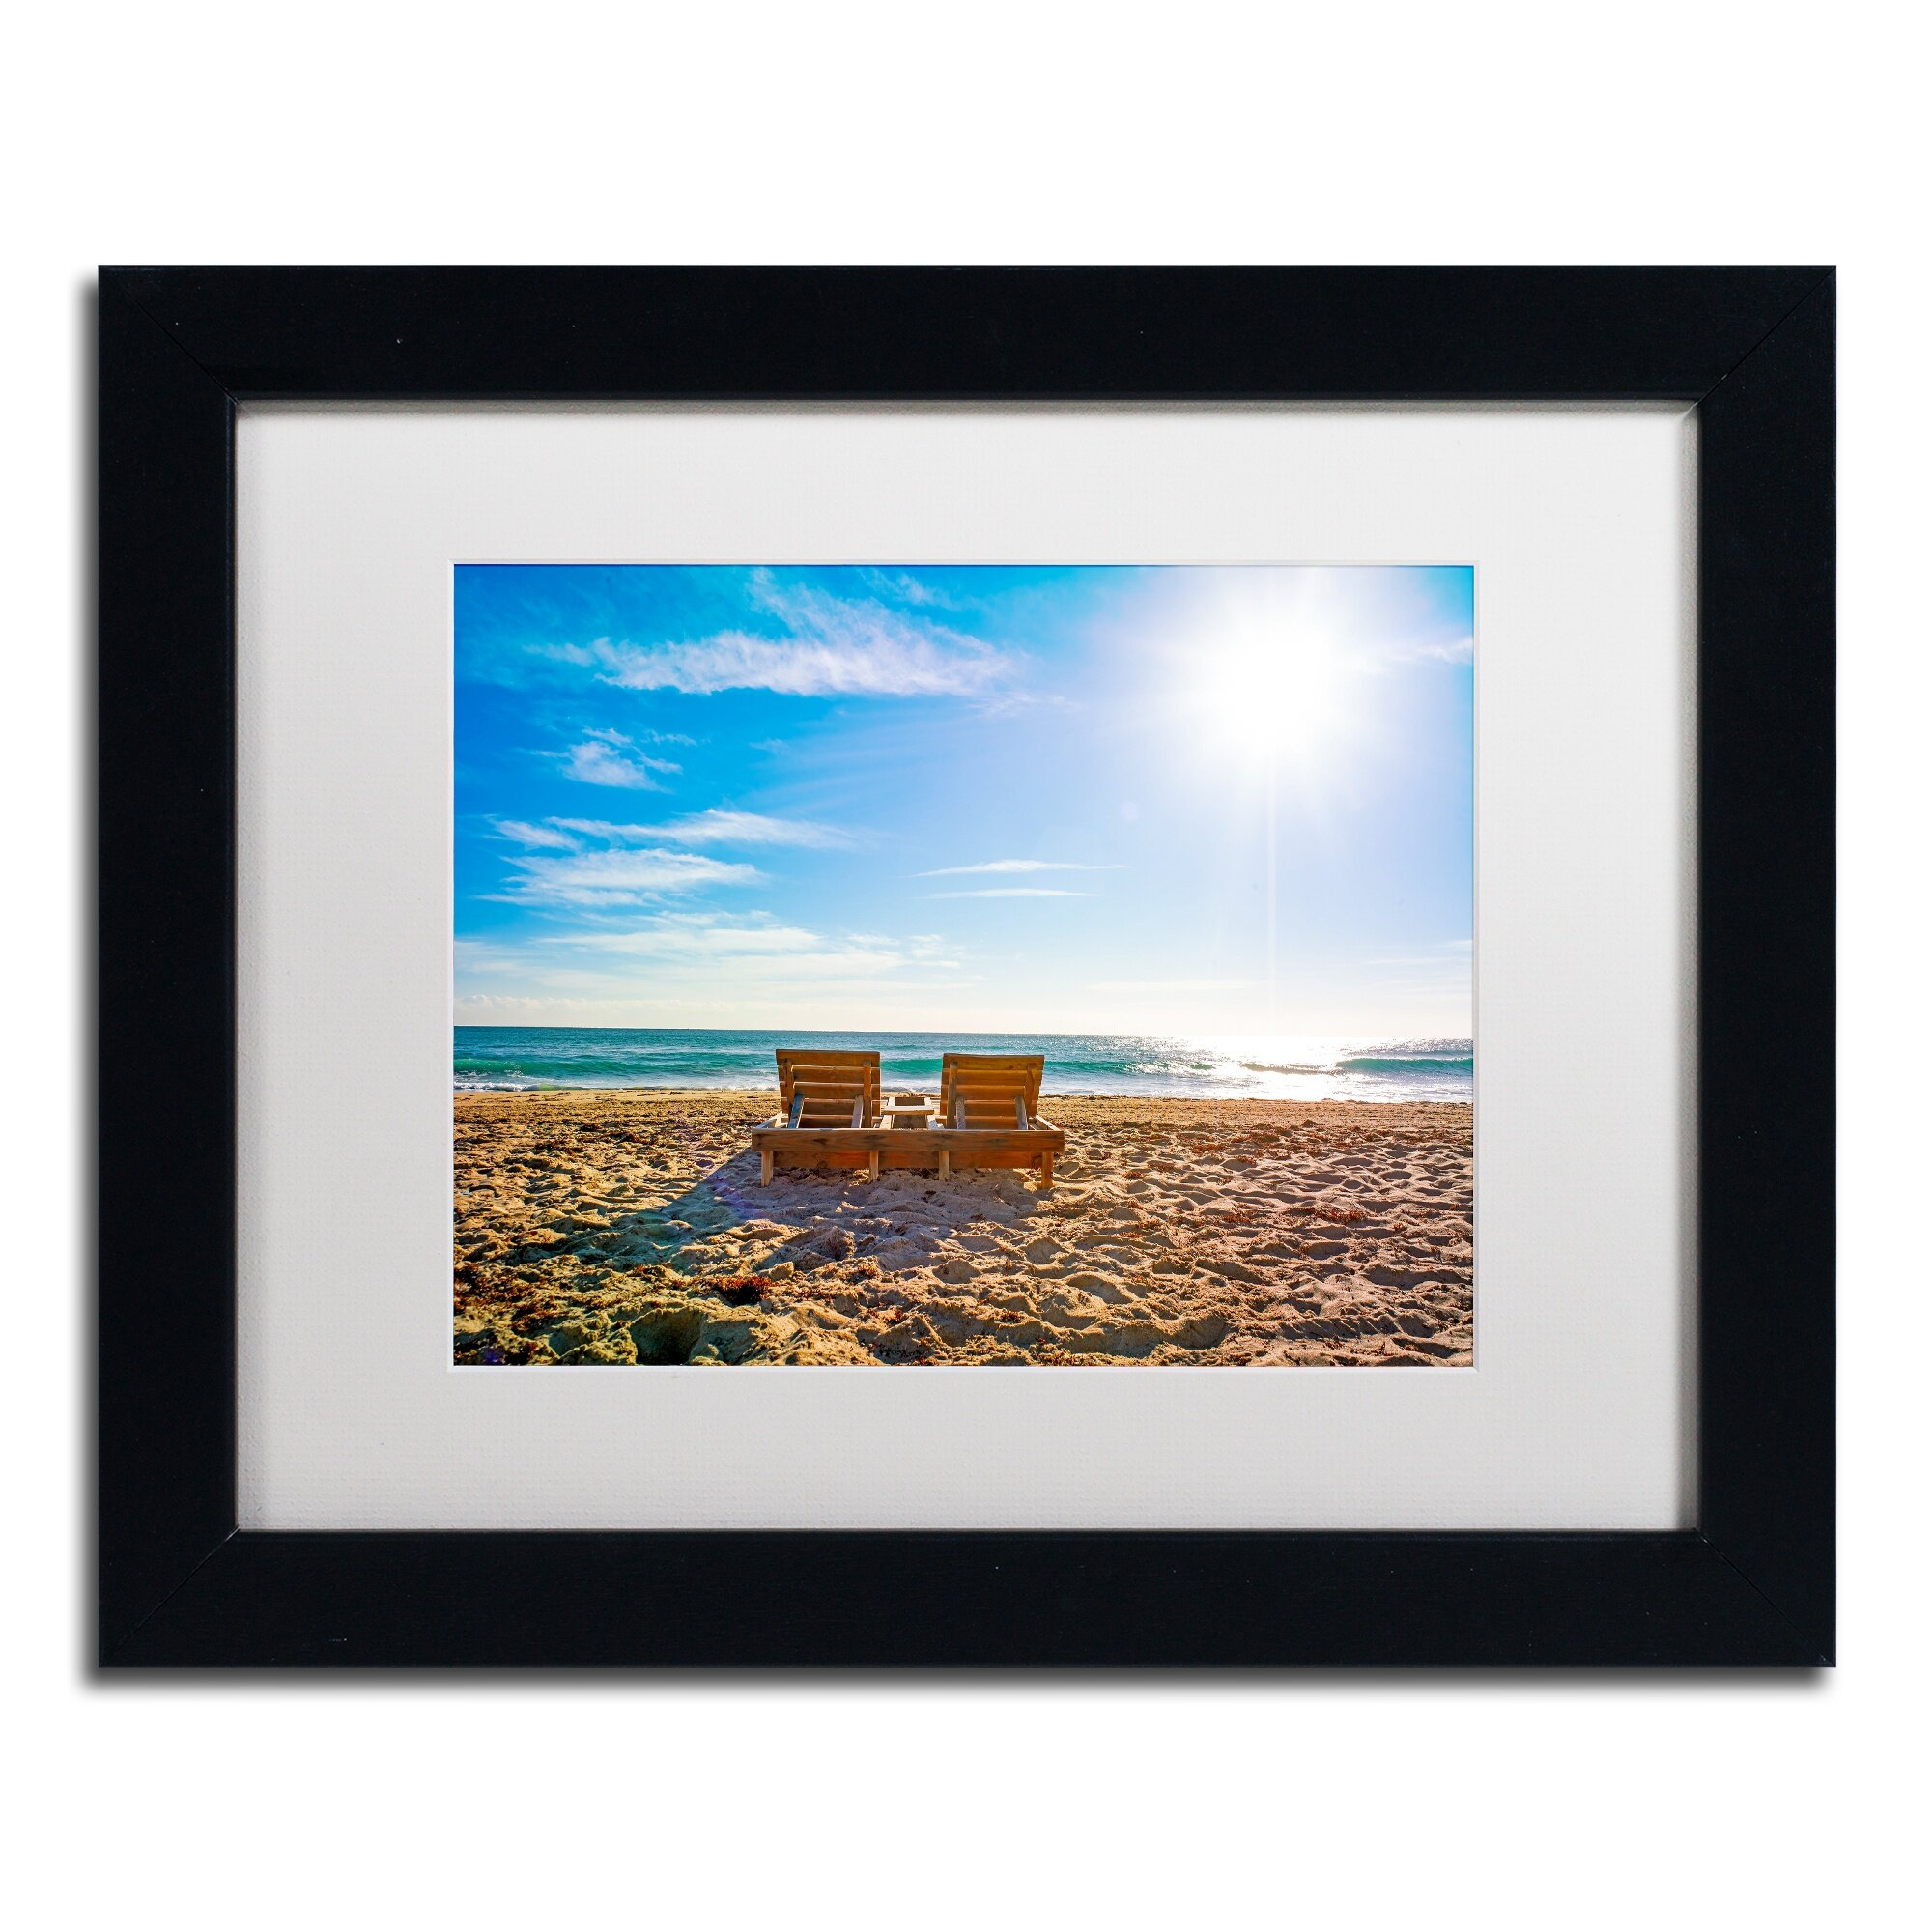 Trademark Art Florida Beach Chair By Preston Framed Photographic Print |  Wayfair